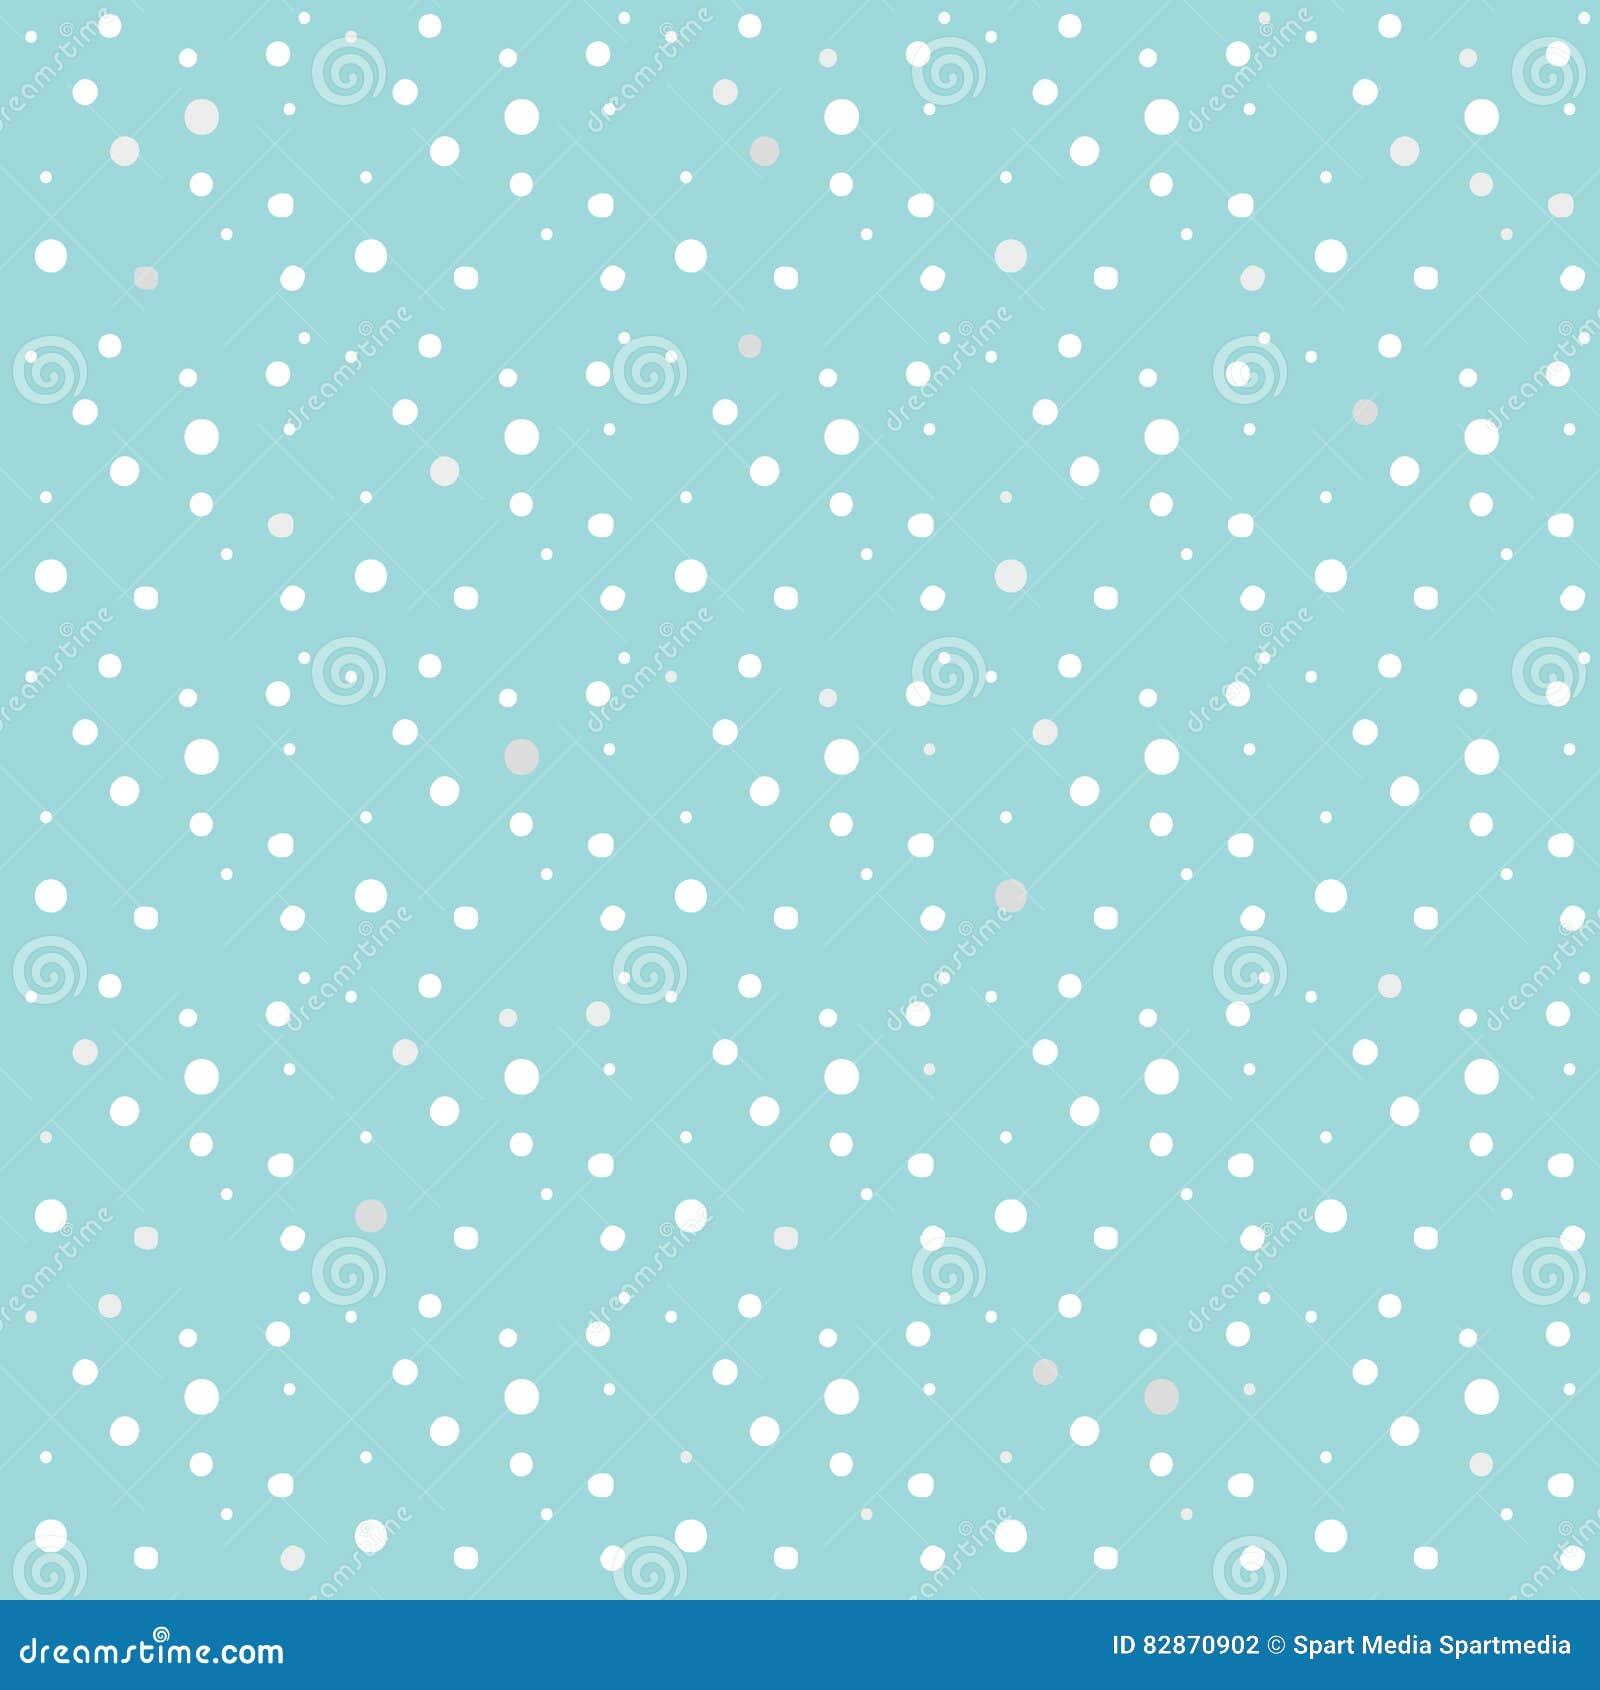 Snowfall Snow Snowflakes New Year 2020 Pattern Stock Vector